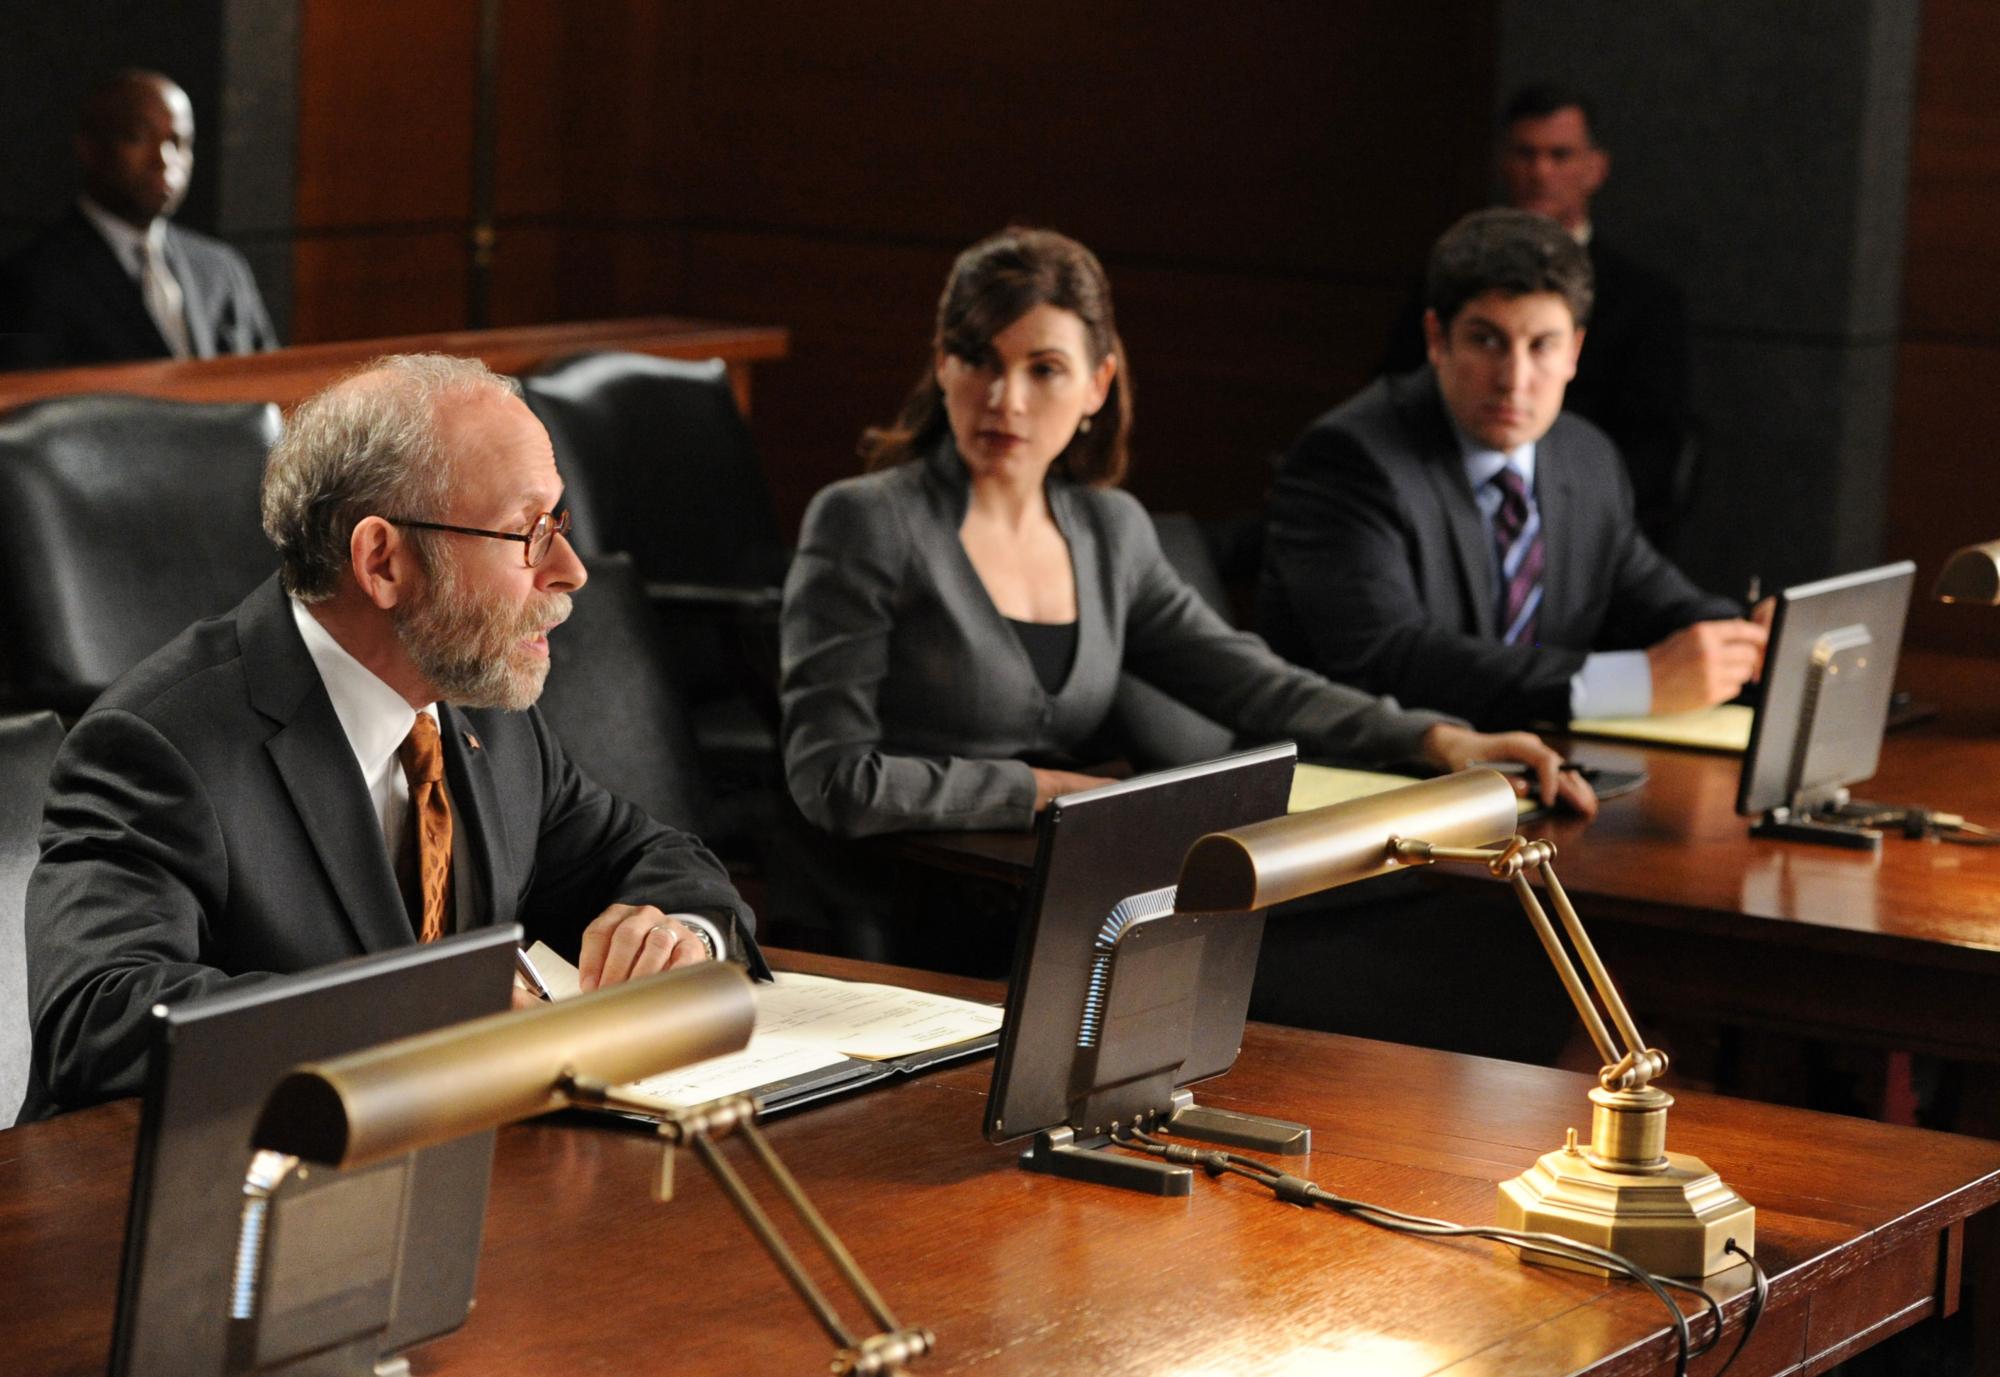 Courtroom Showdown